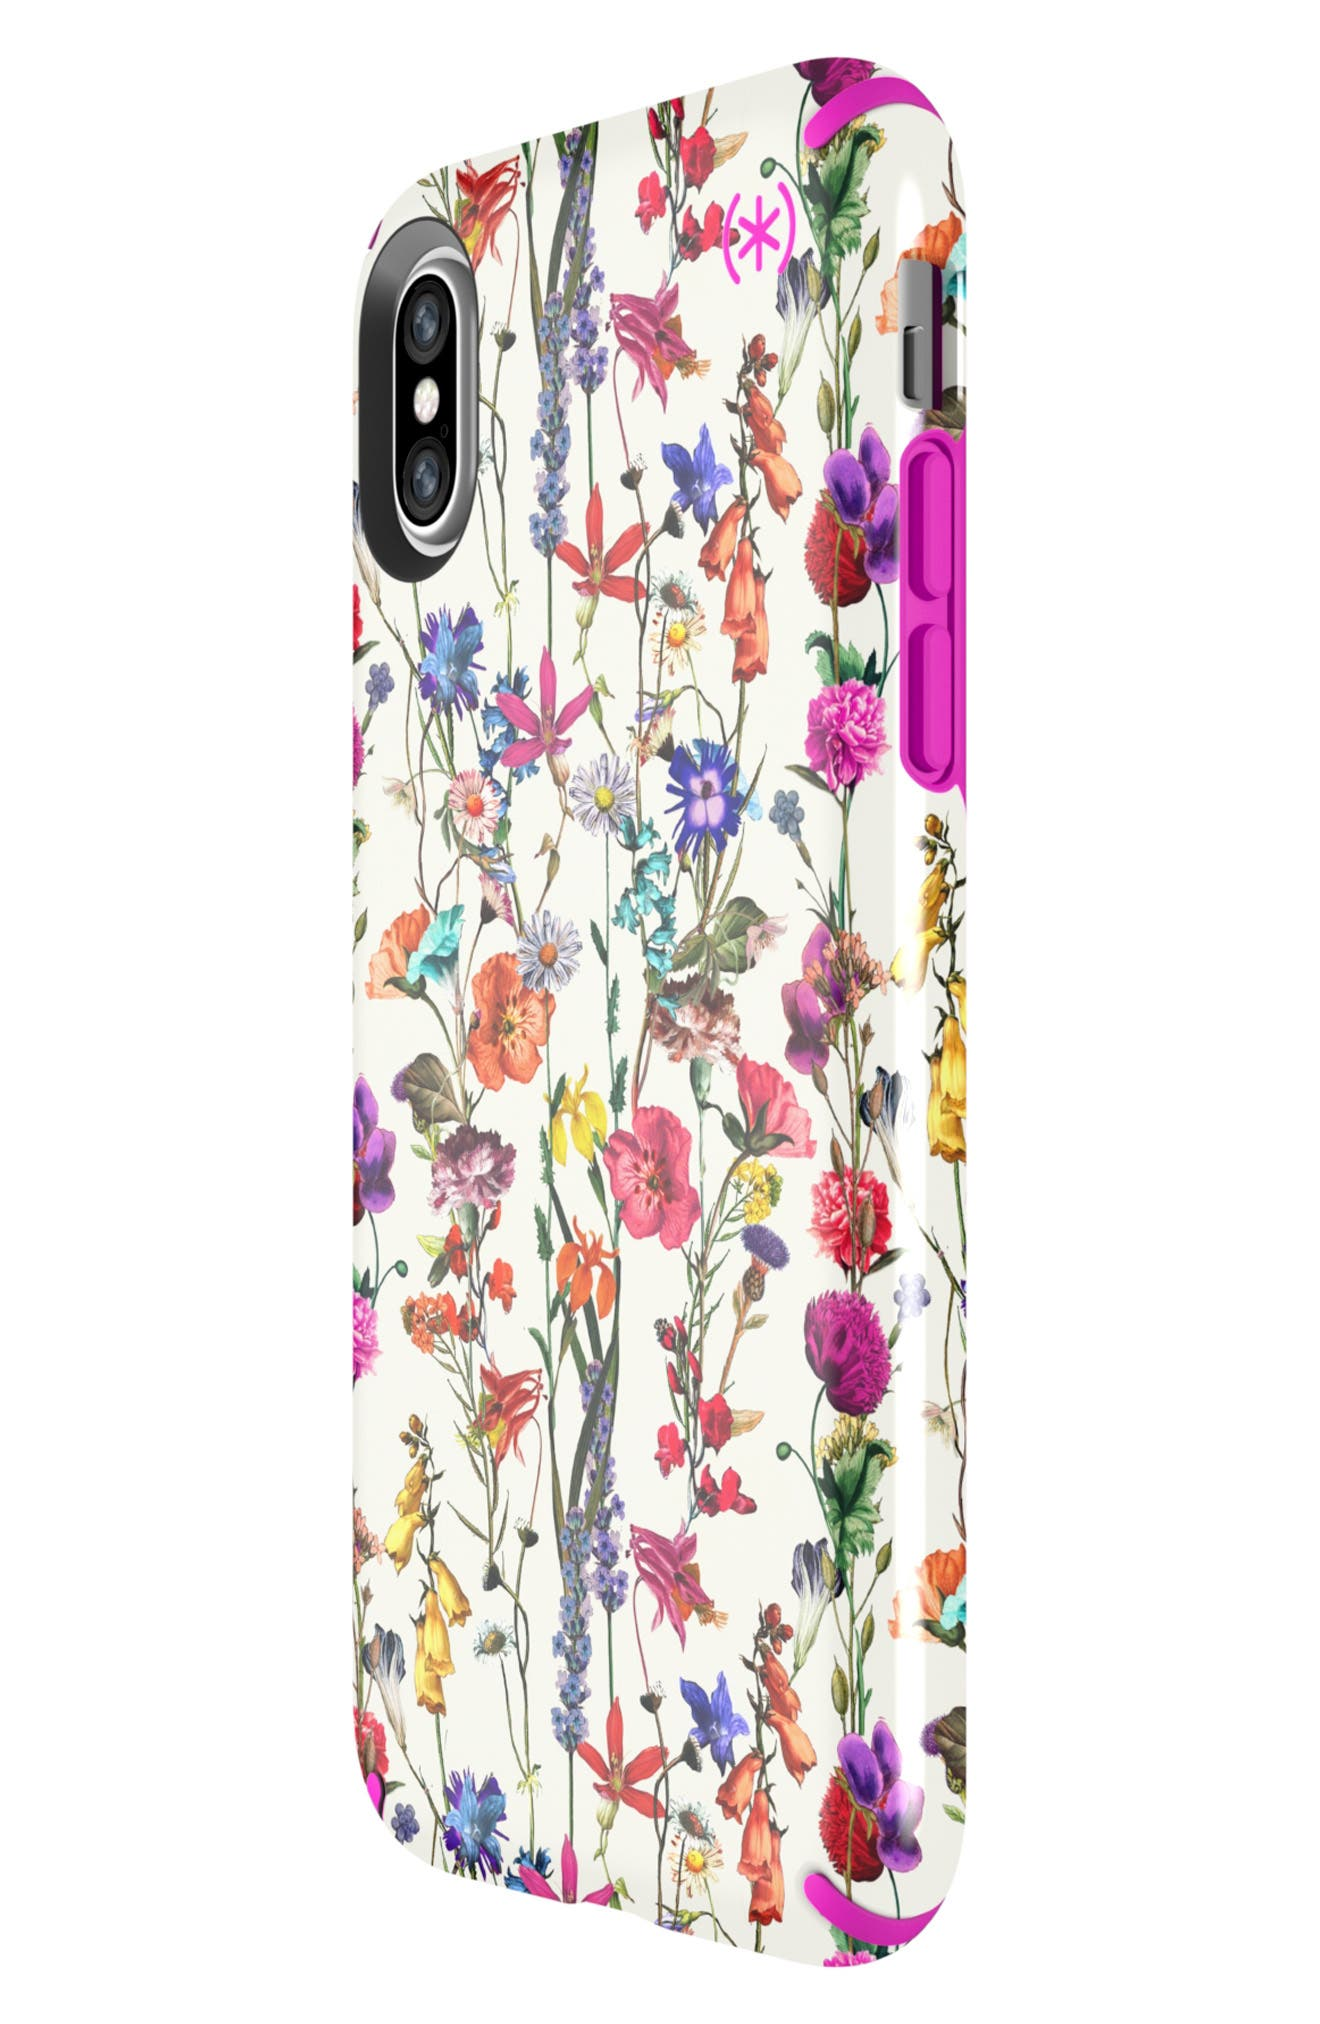 Presidio Inked iPhone X & Xs Case,                             Alternate thumbnail 7, color,                             WHITEFLOWERS/ LIPSTICK PINK